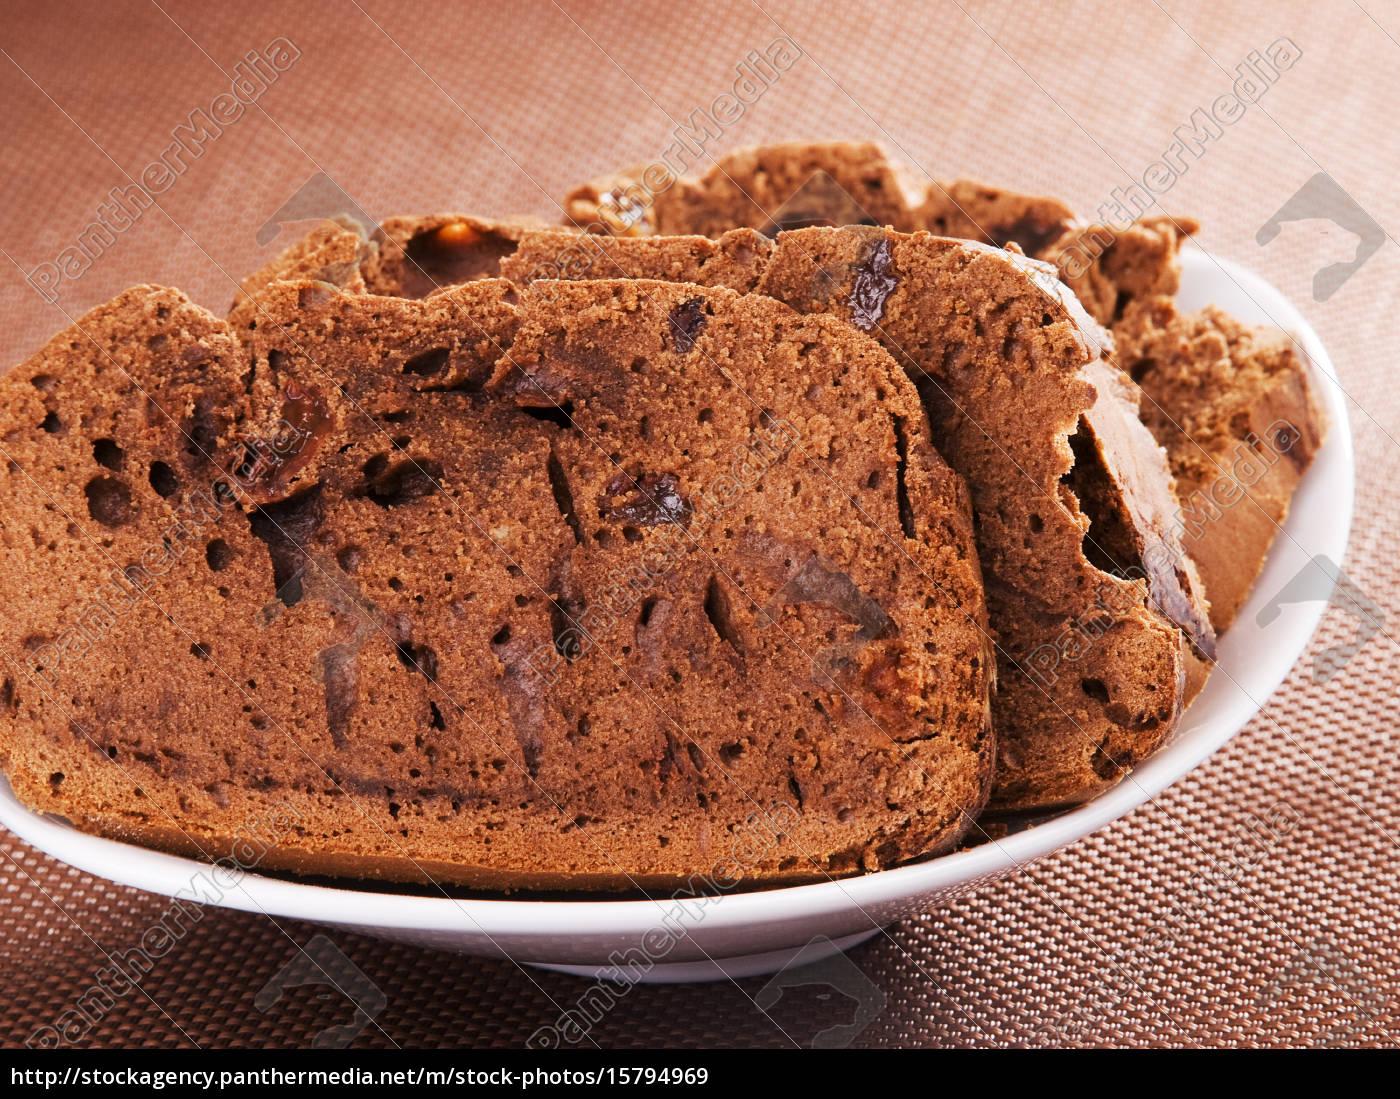 chocolate, cake, chocolate, cake, chocolate, cake, chocolate, cake - 15794969